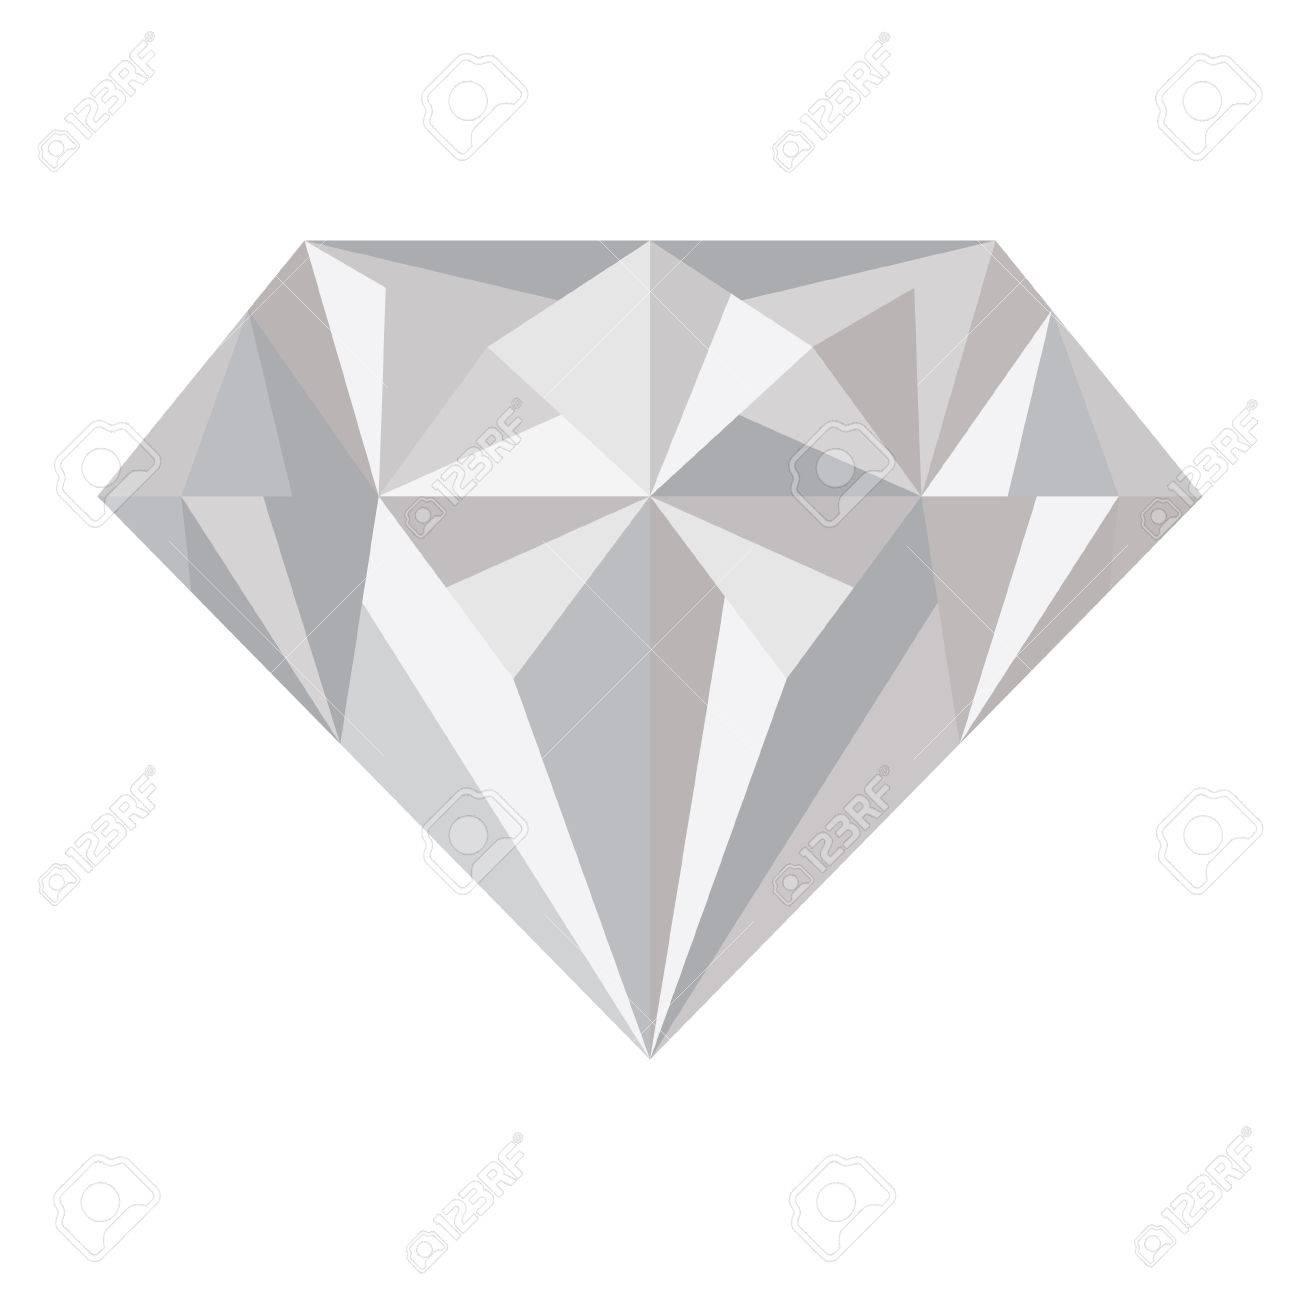 diamond vector - 41430931